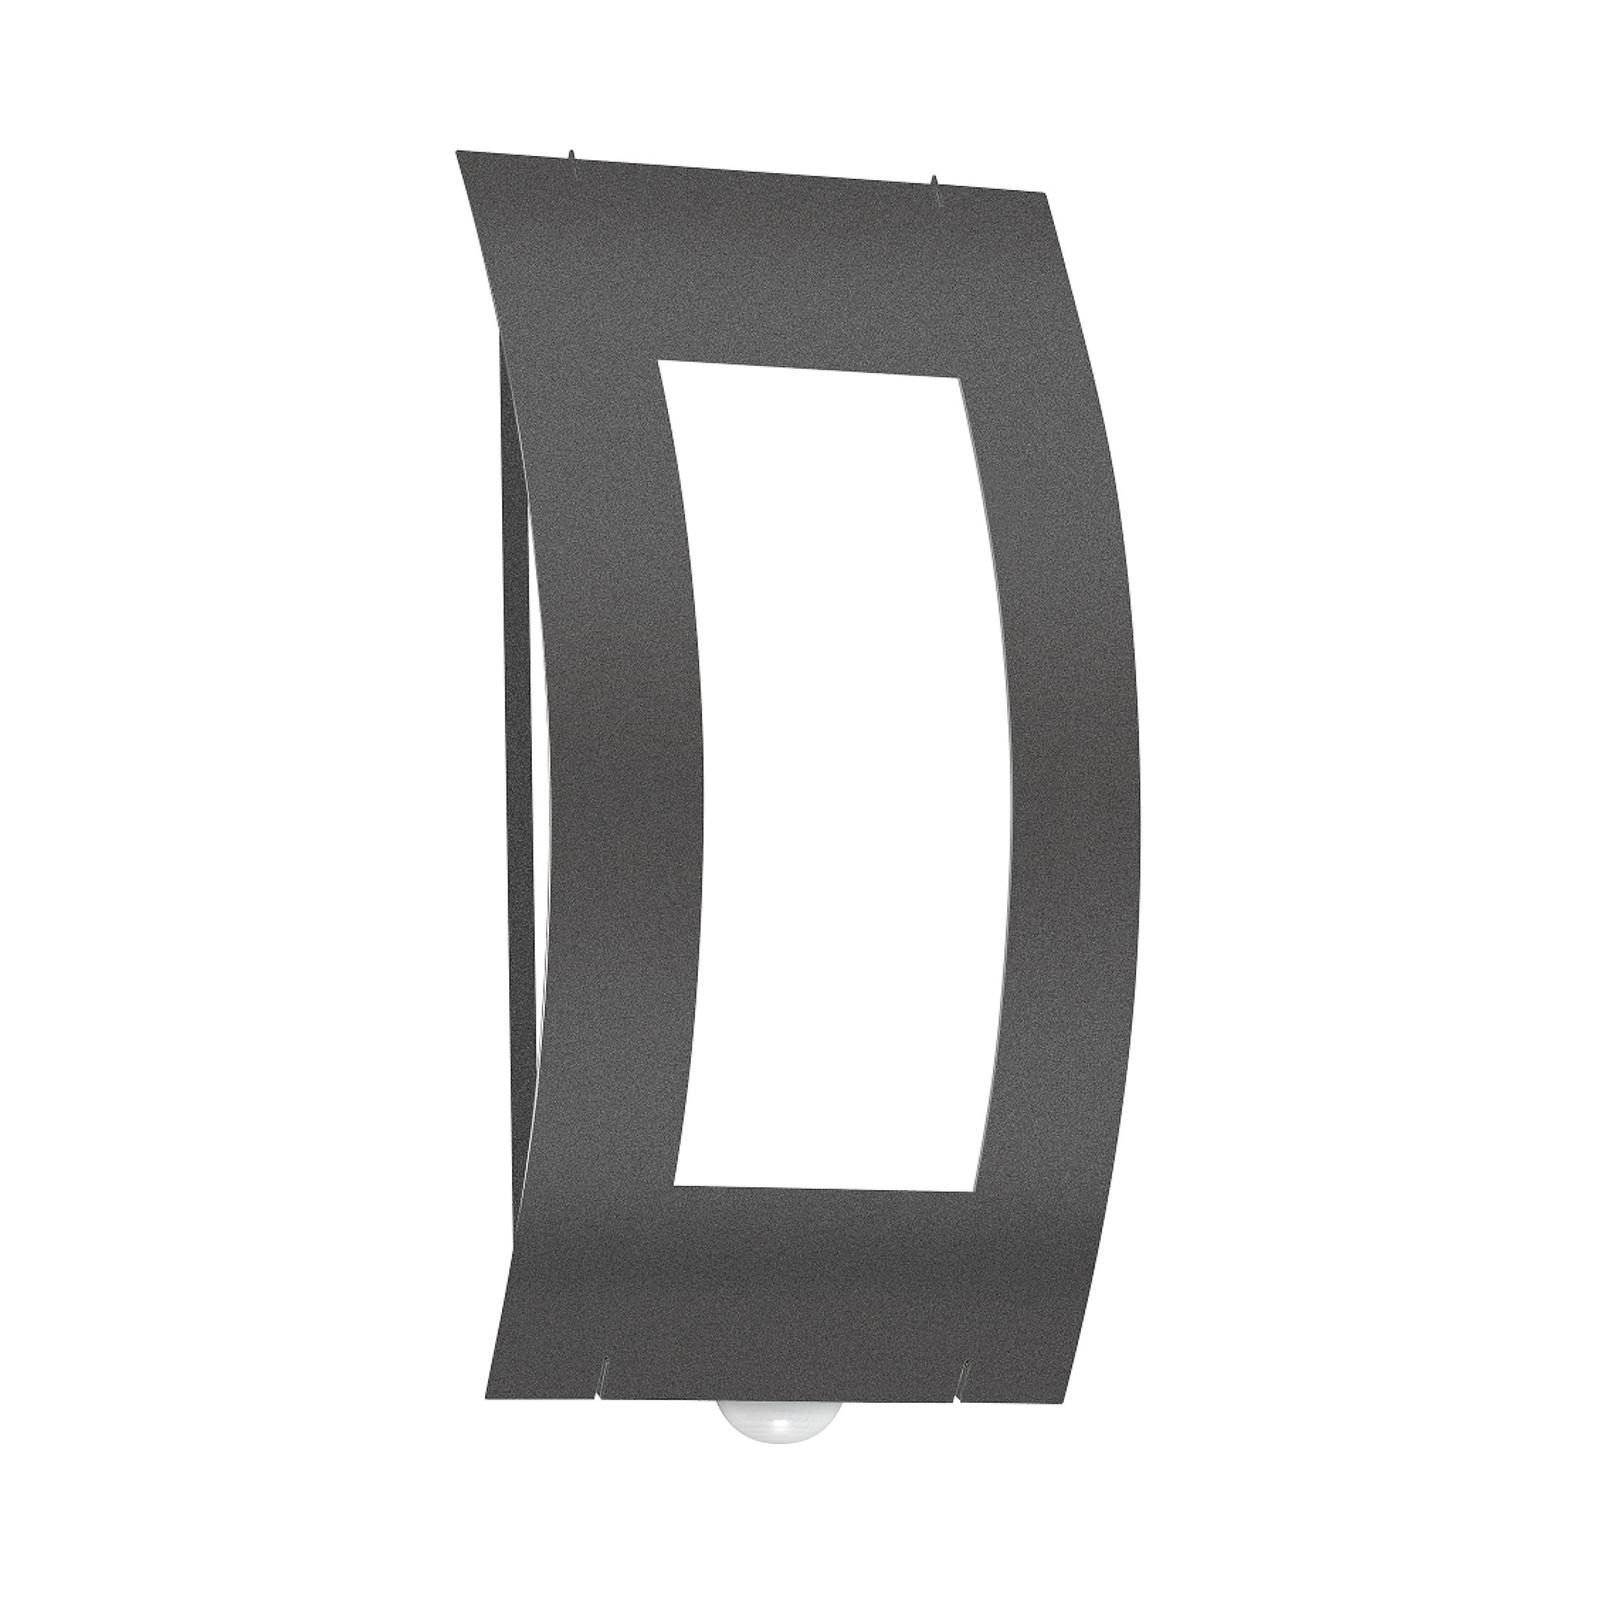 Nila Exterior Wall Lamp - Incl. Motion Detector_2011172_1